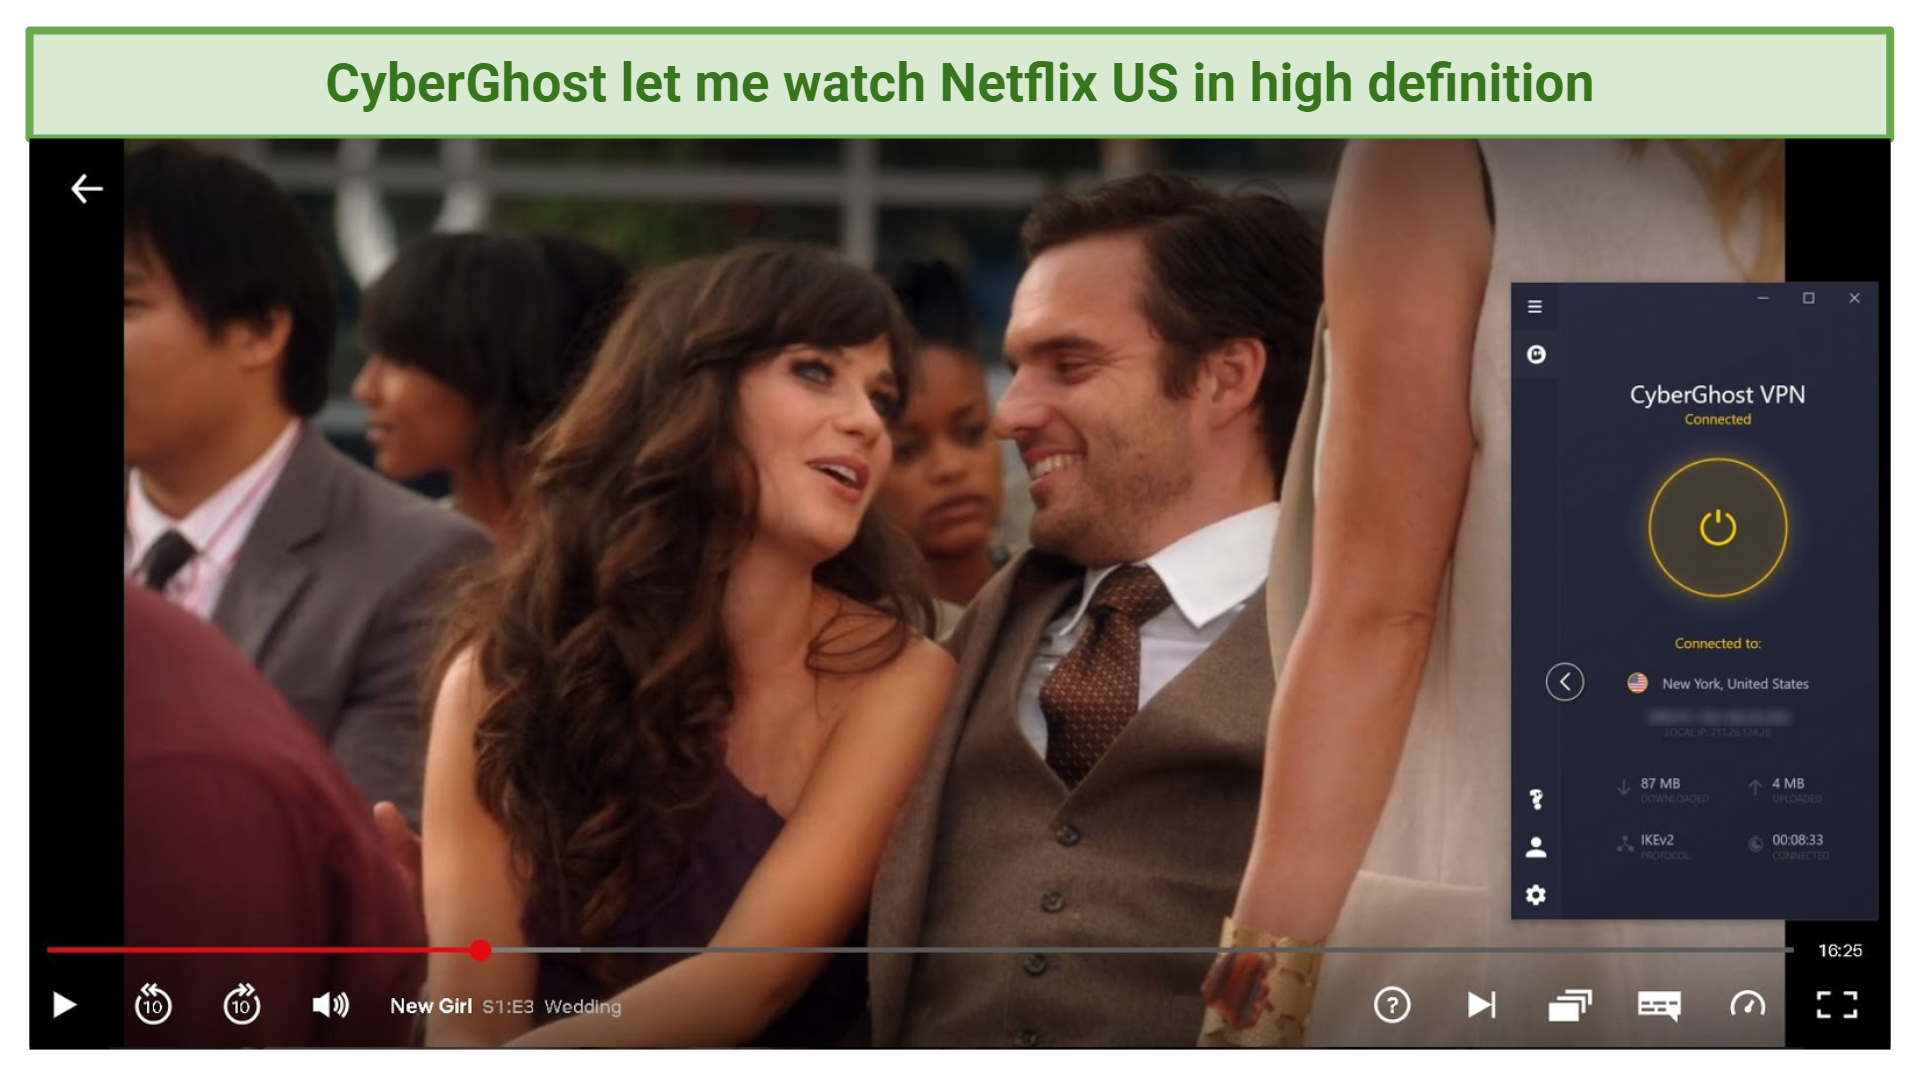 A screenshot of CyberGhost unblocking New Girl on Netflix US.